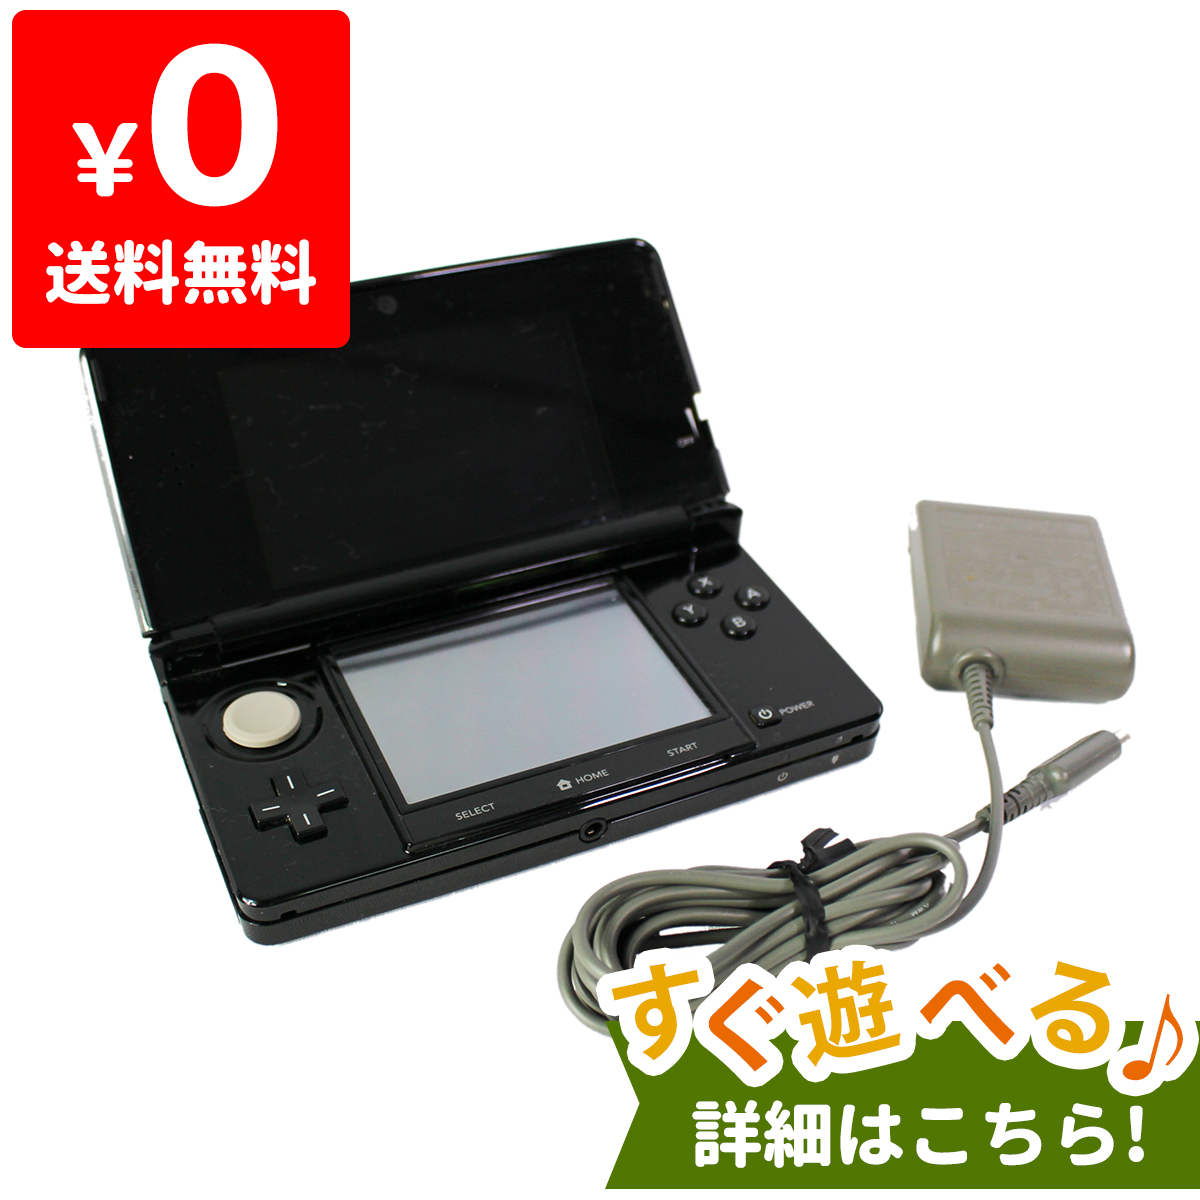 3DS ニンテンドー3DS クリアブラック(CTR-S-WEBA) 本体 すぐ遊べるセット Nintendo 任天堂 ニンテンドー 中古 4902370520804 送料無料 【中古】